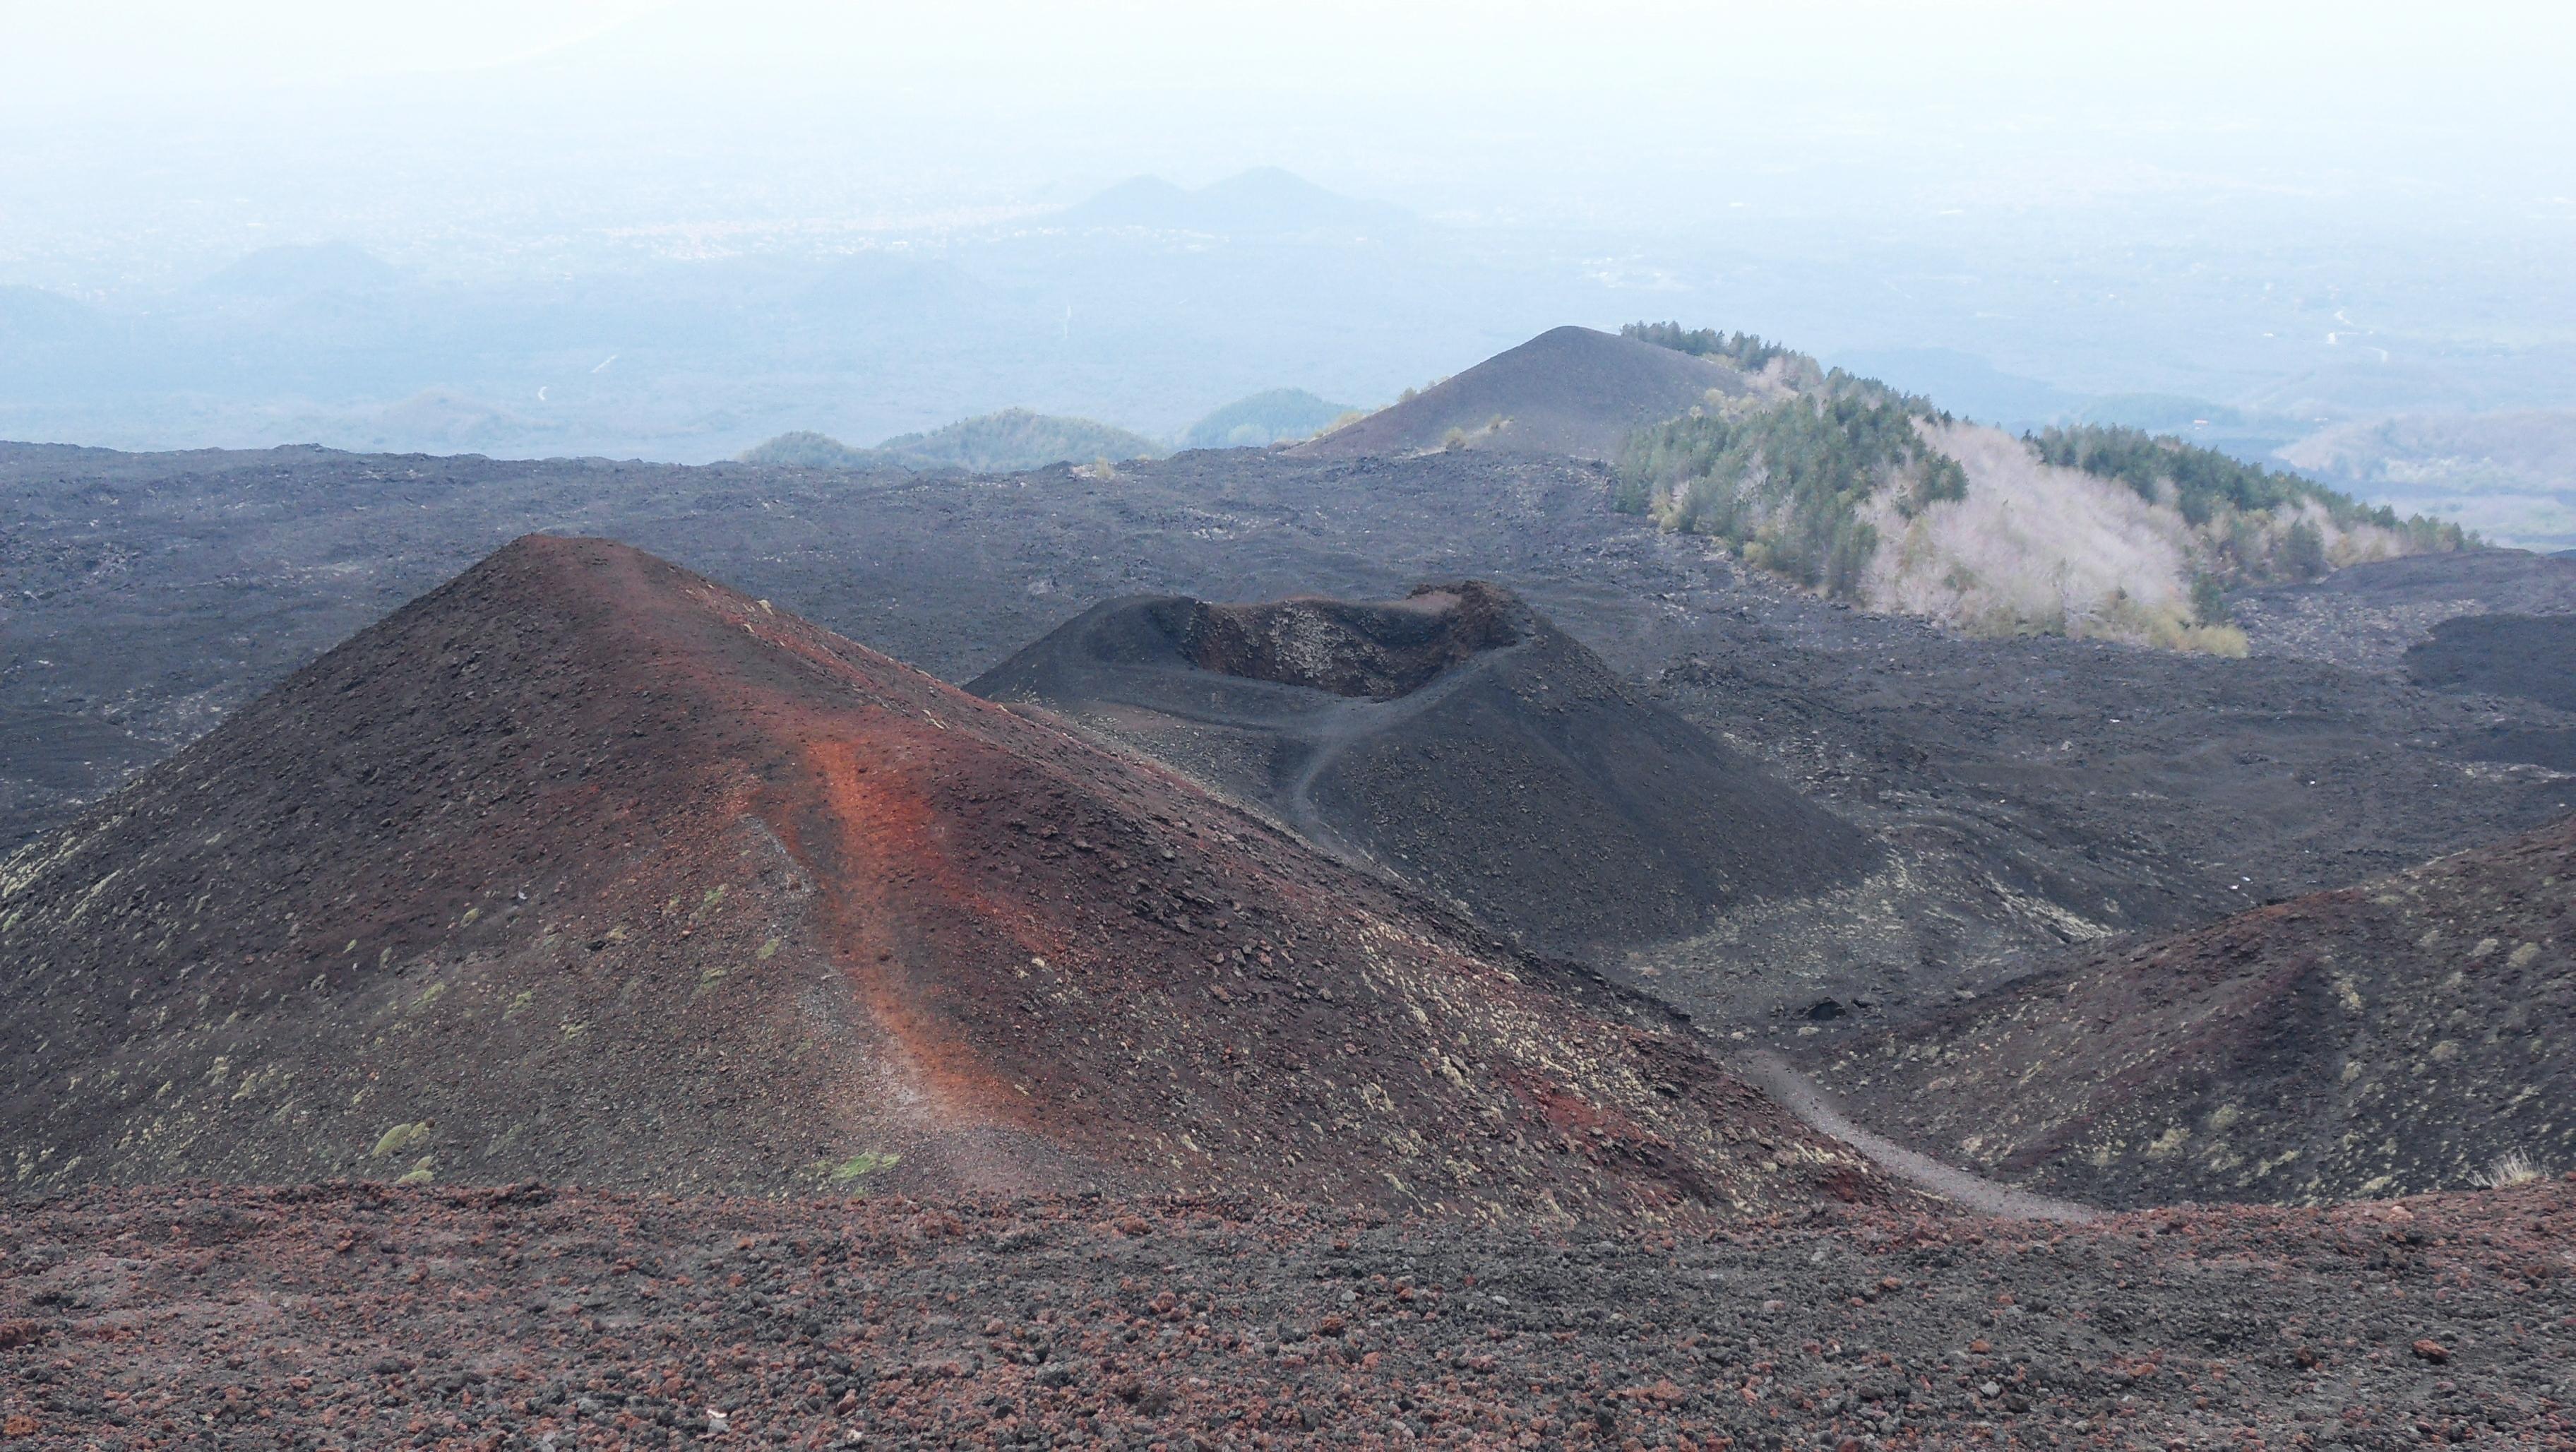 Top Etna vulcano Sicily